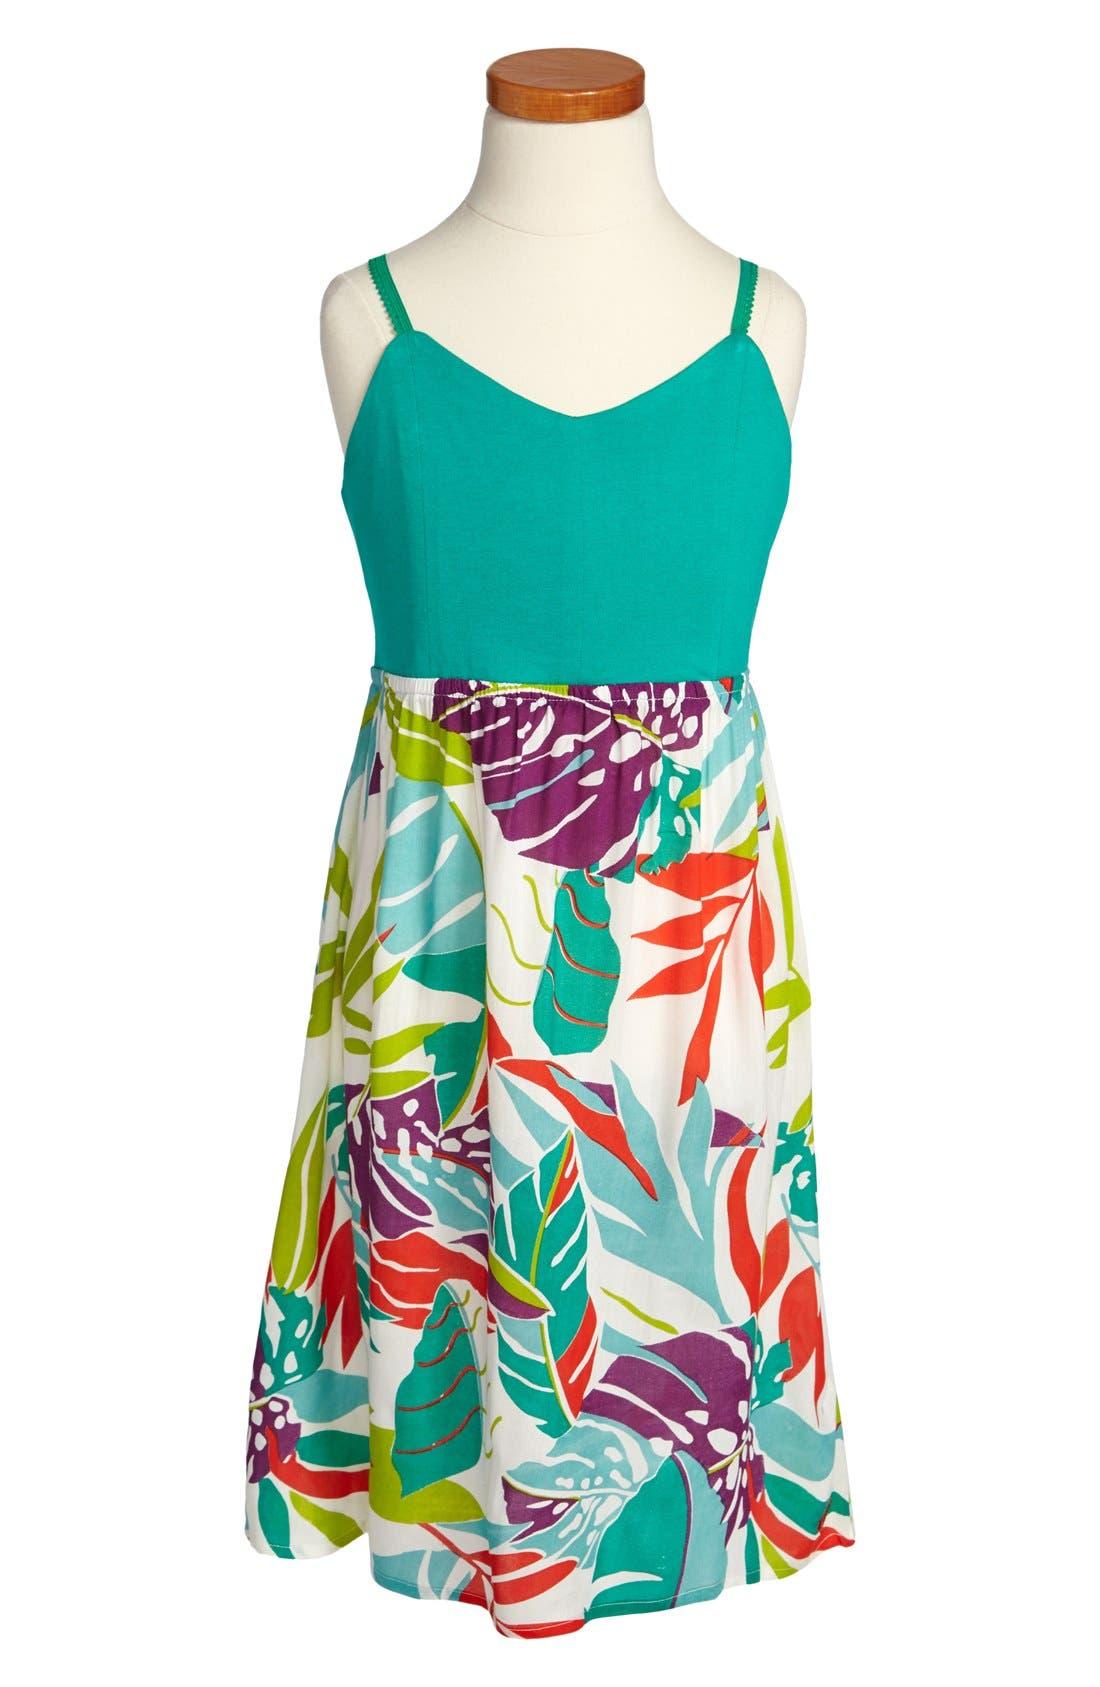 Alternate Image 1 Selected - Roxy 'Open Season' Sleeveless Maxi Dress  (Big Girls)